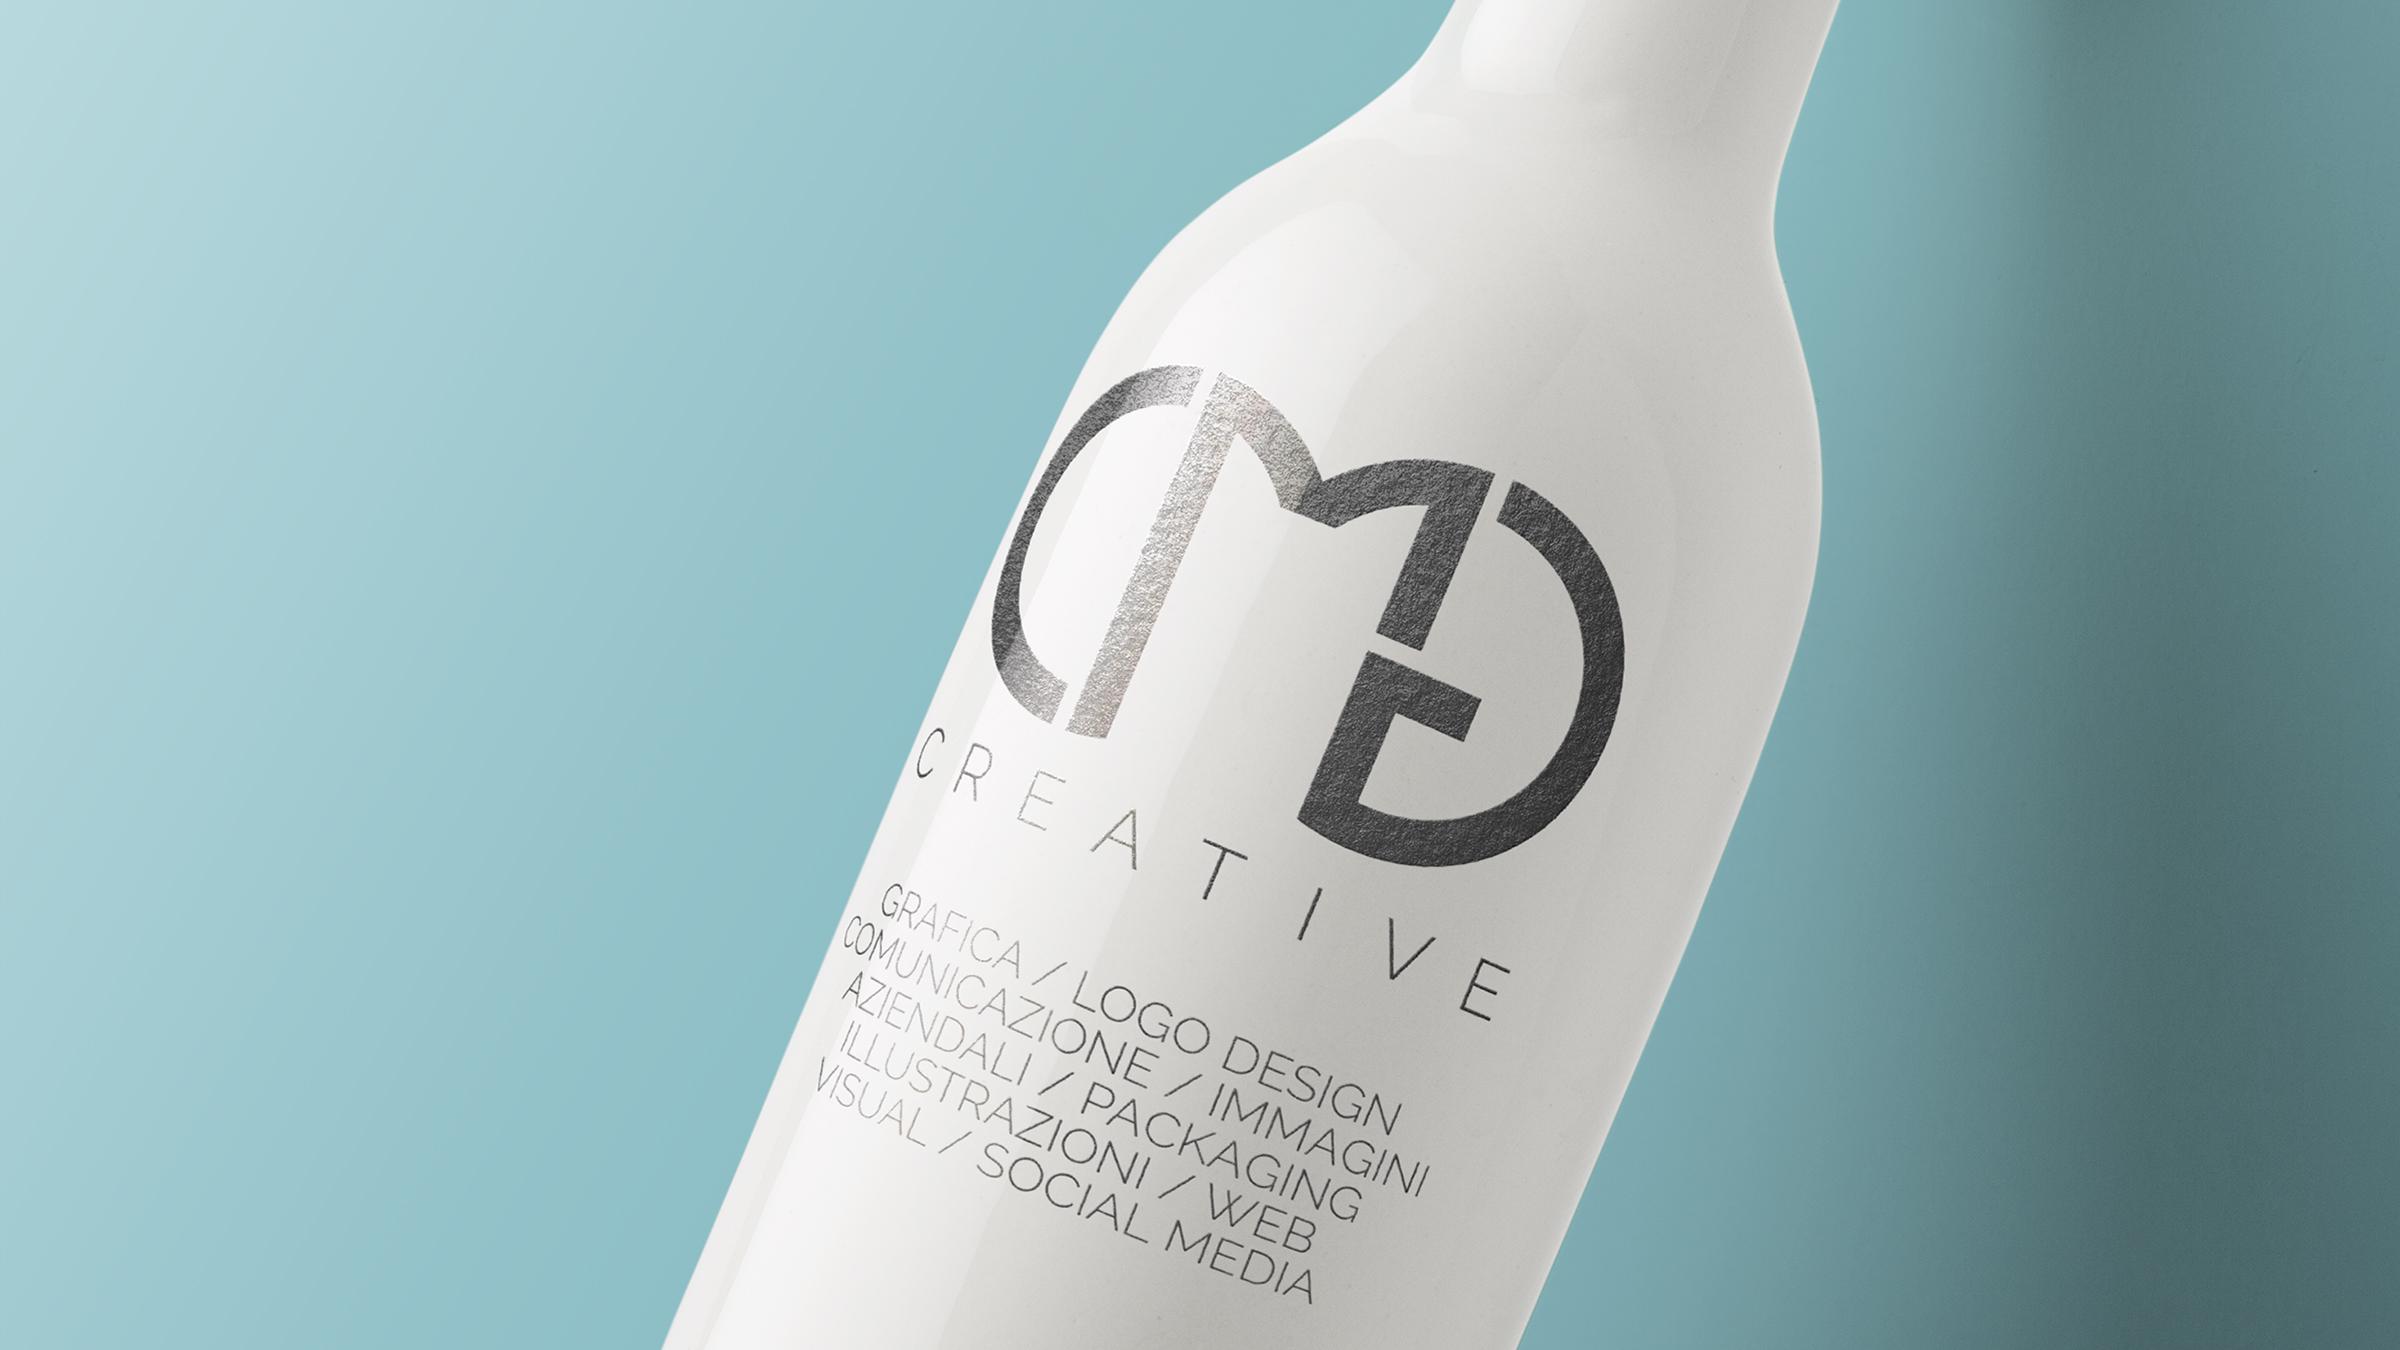 CMG-grafico-creativo-freelance-Treviso